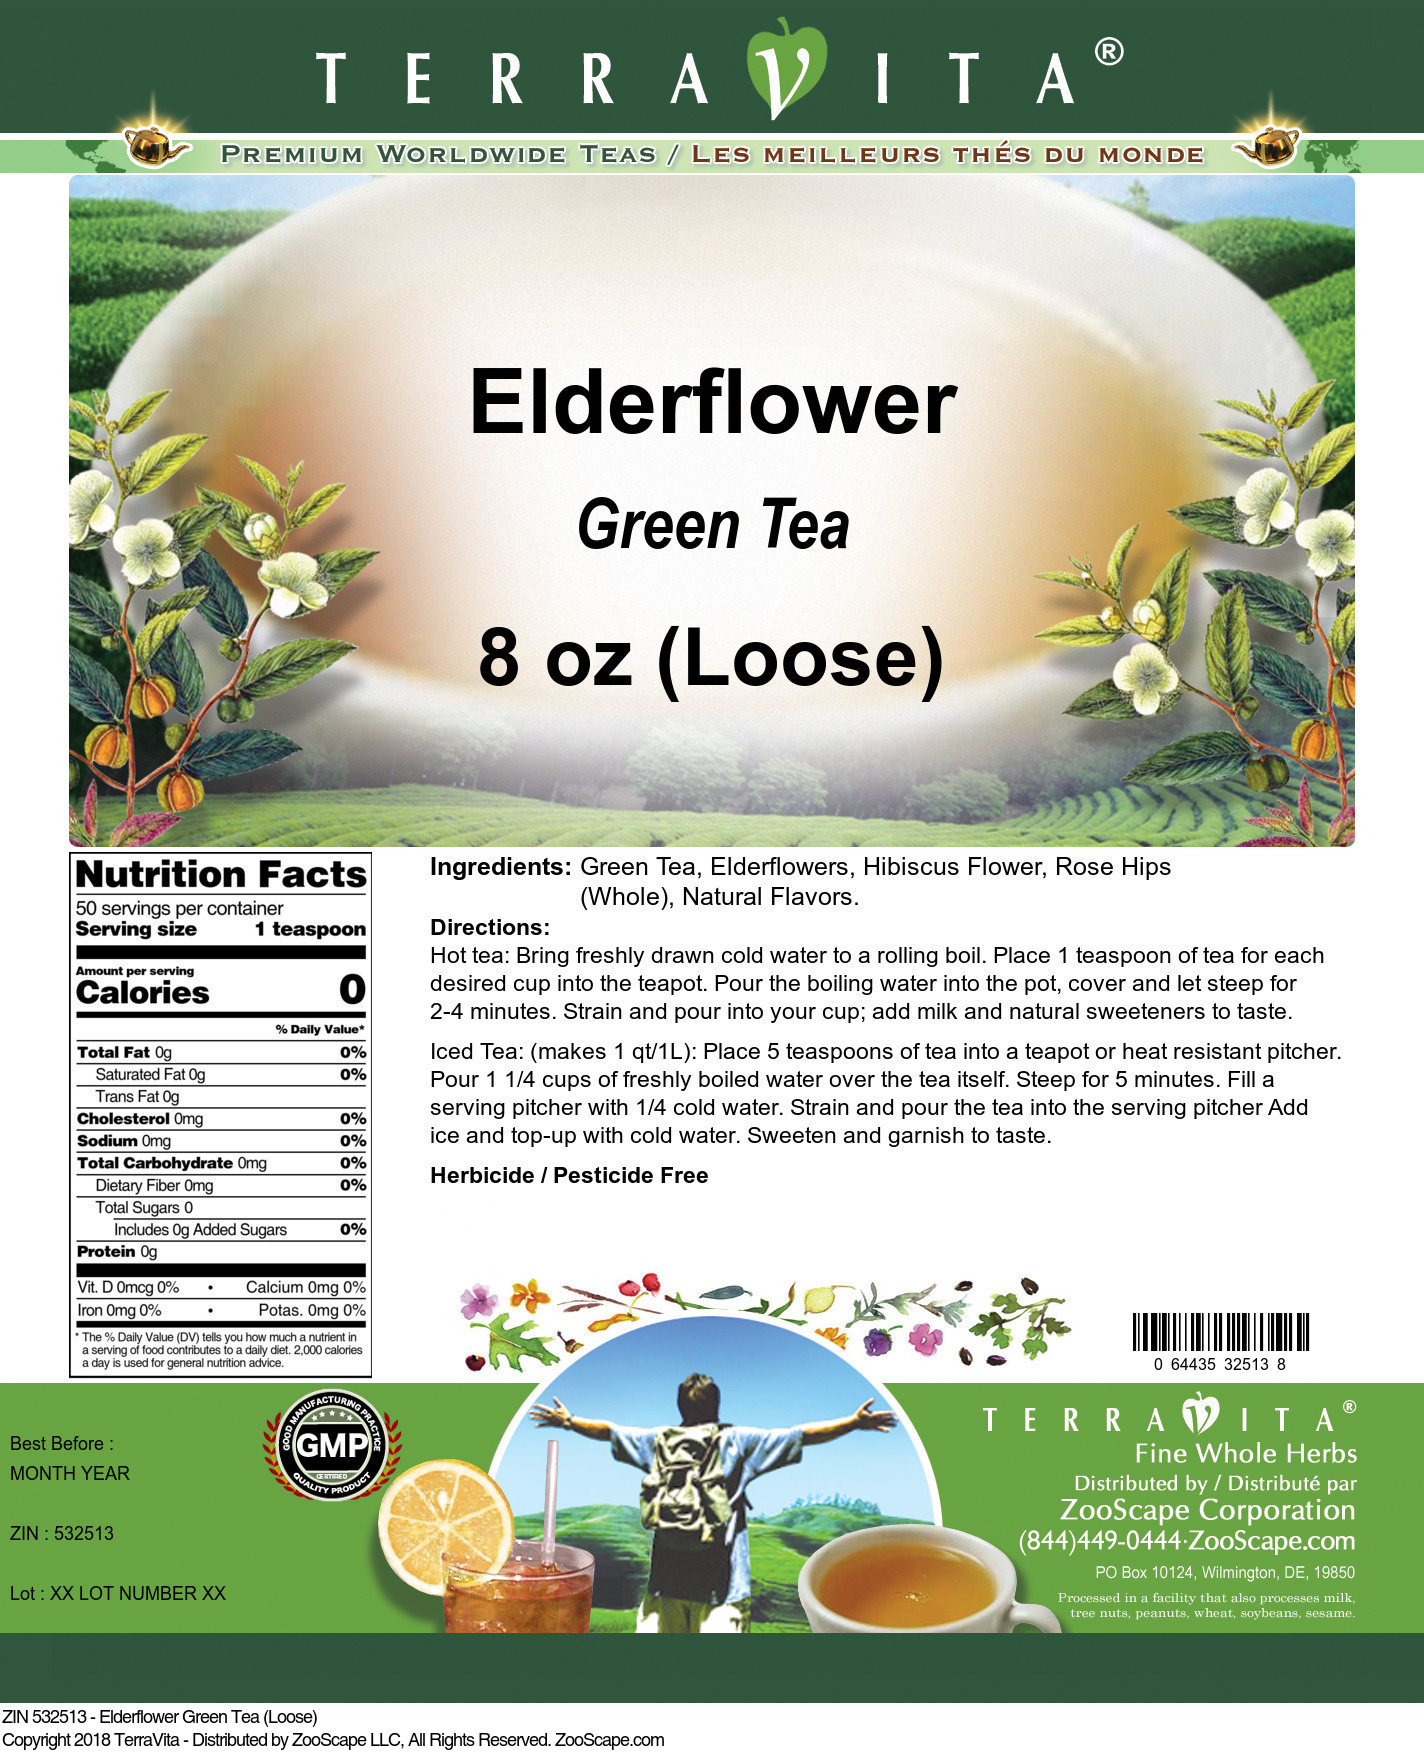 Elderflower Green Tea (Loose)